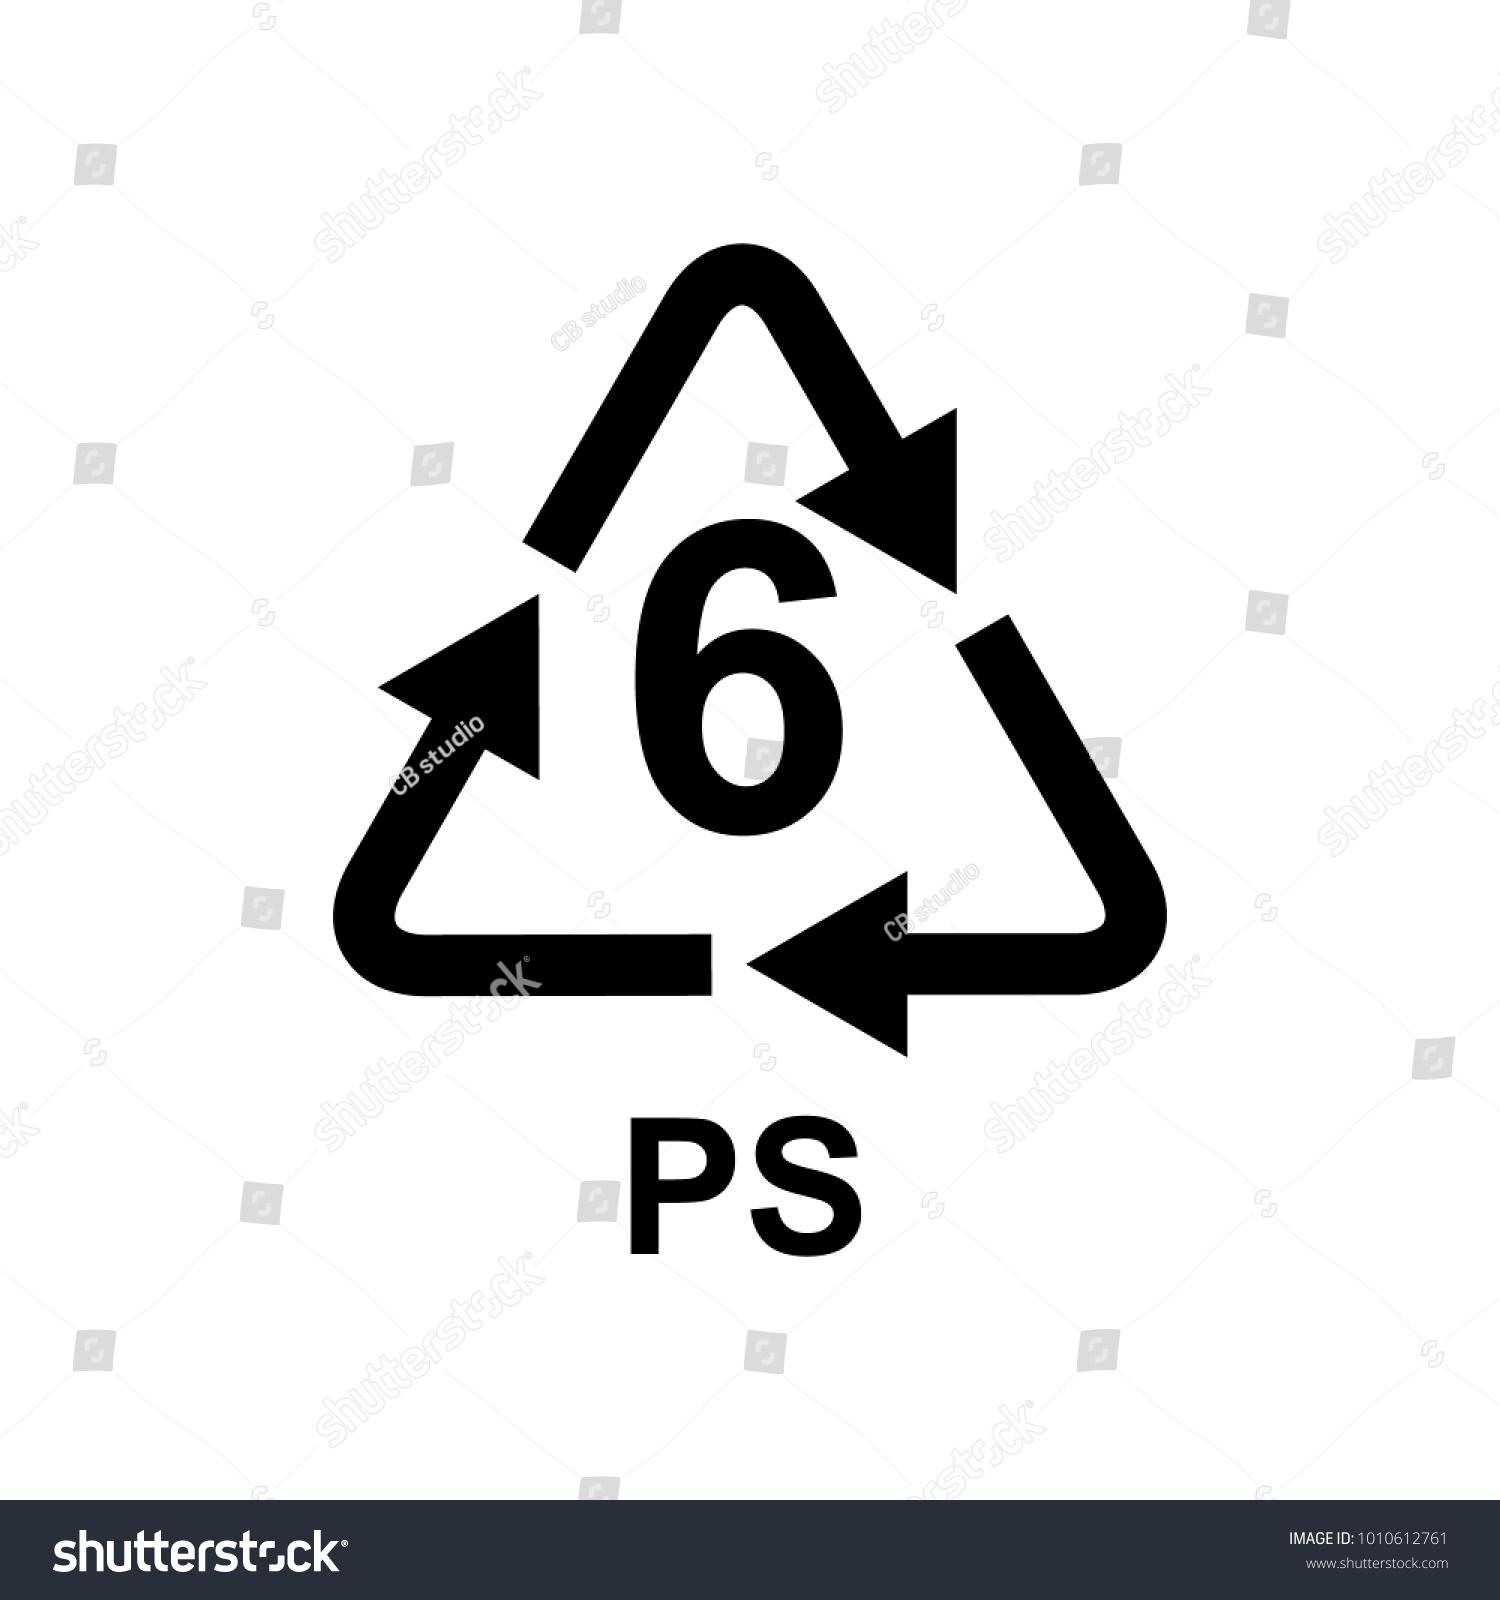 Plastic Recycling Symbol 6 Ps Stock Vector 2018 1010612761